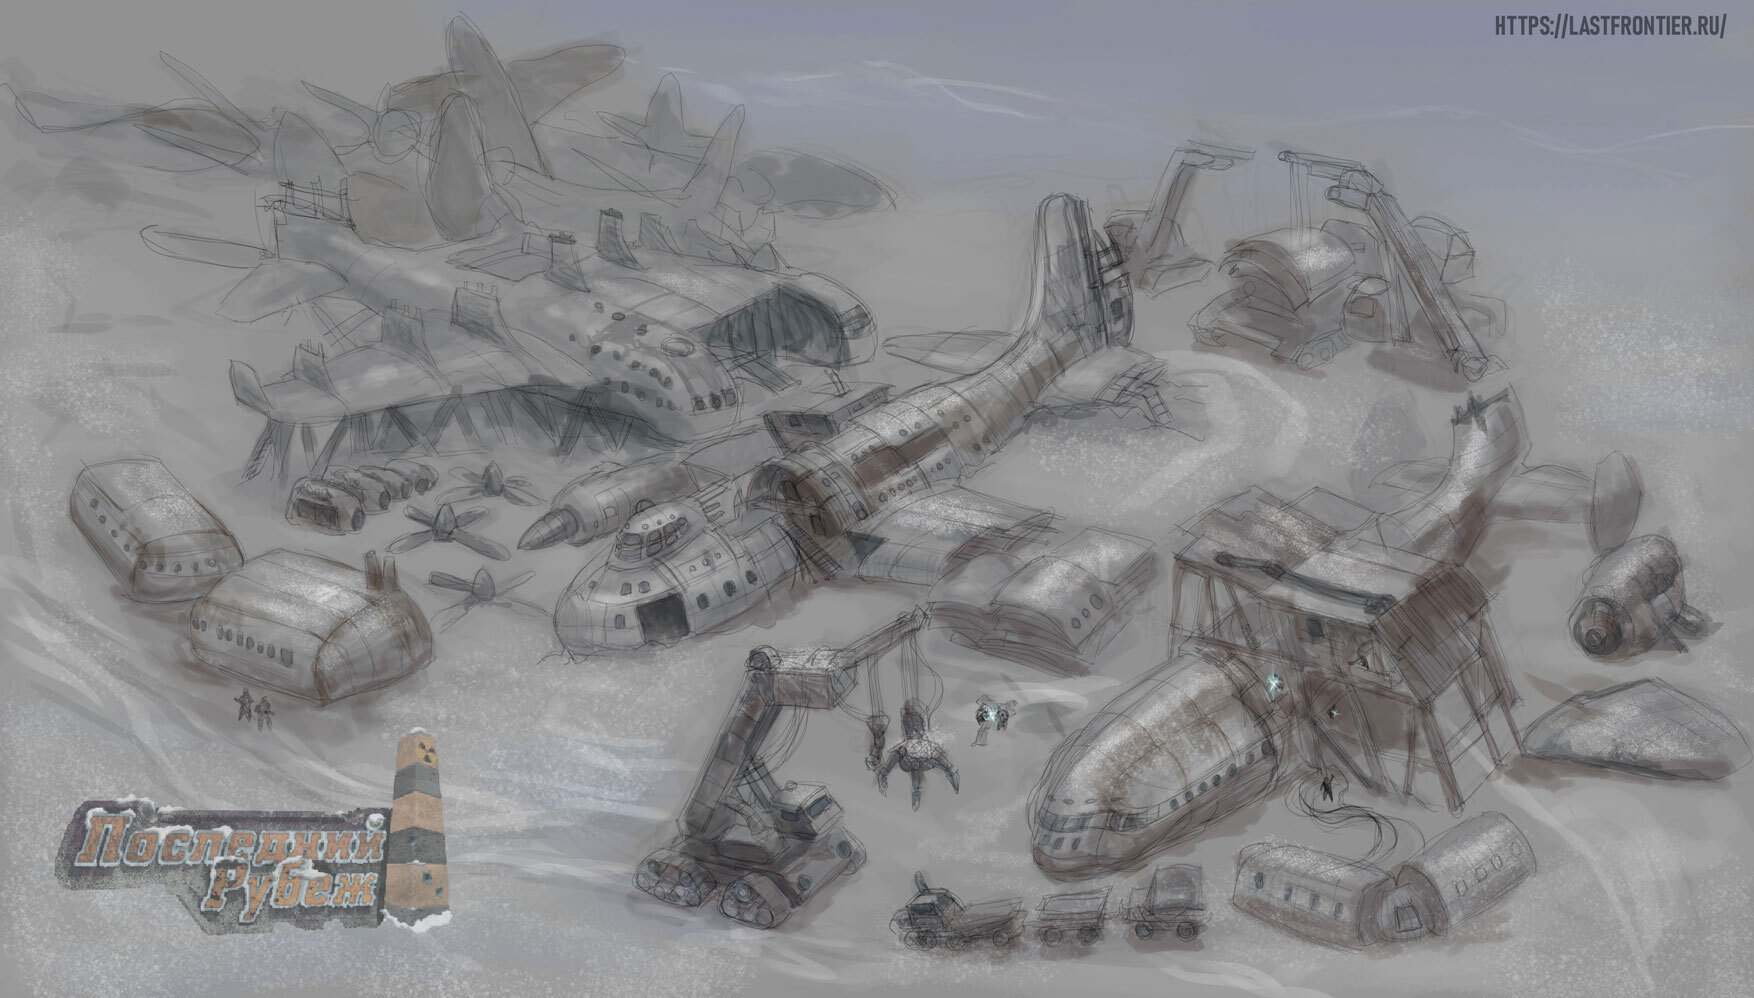 Lasf-Frontier-MMORPG-New-Gambell-constru